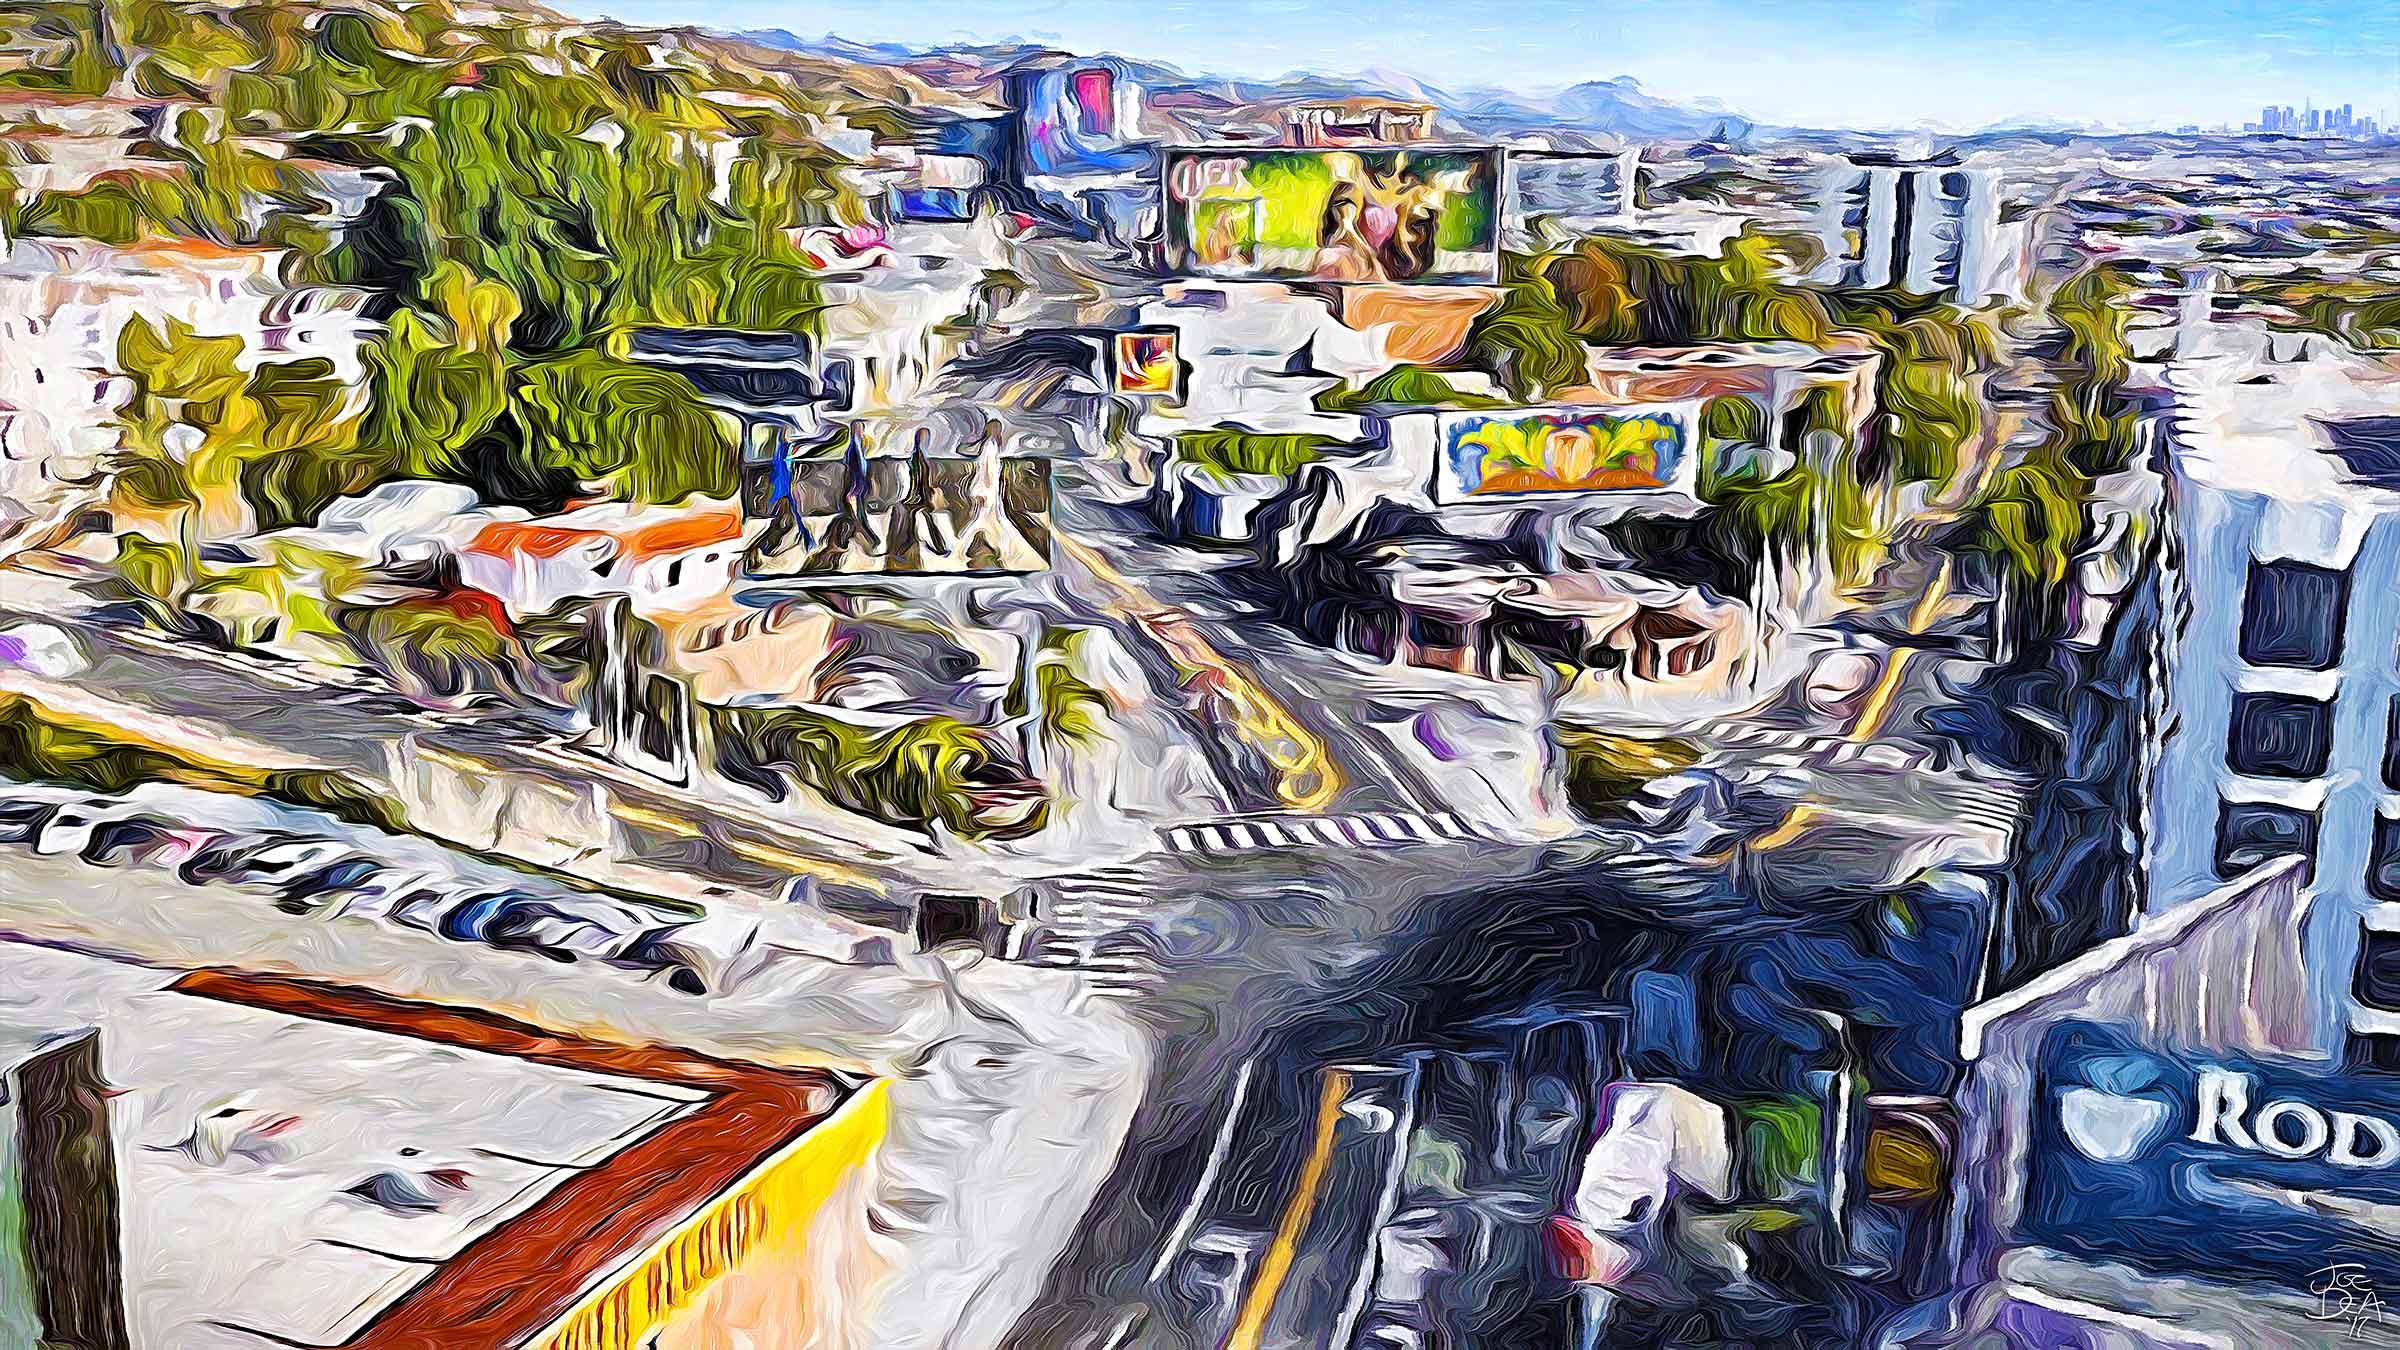 Joe-Dea-Sunset-Holloway-painting-web-LB.jpg